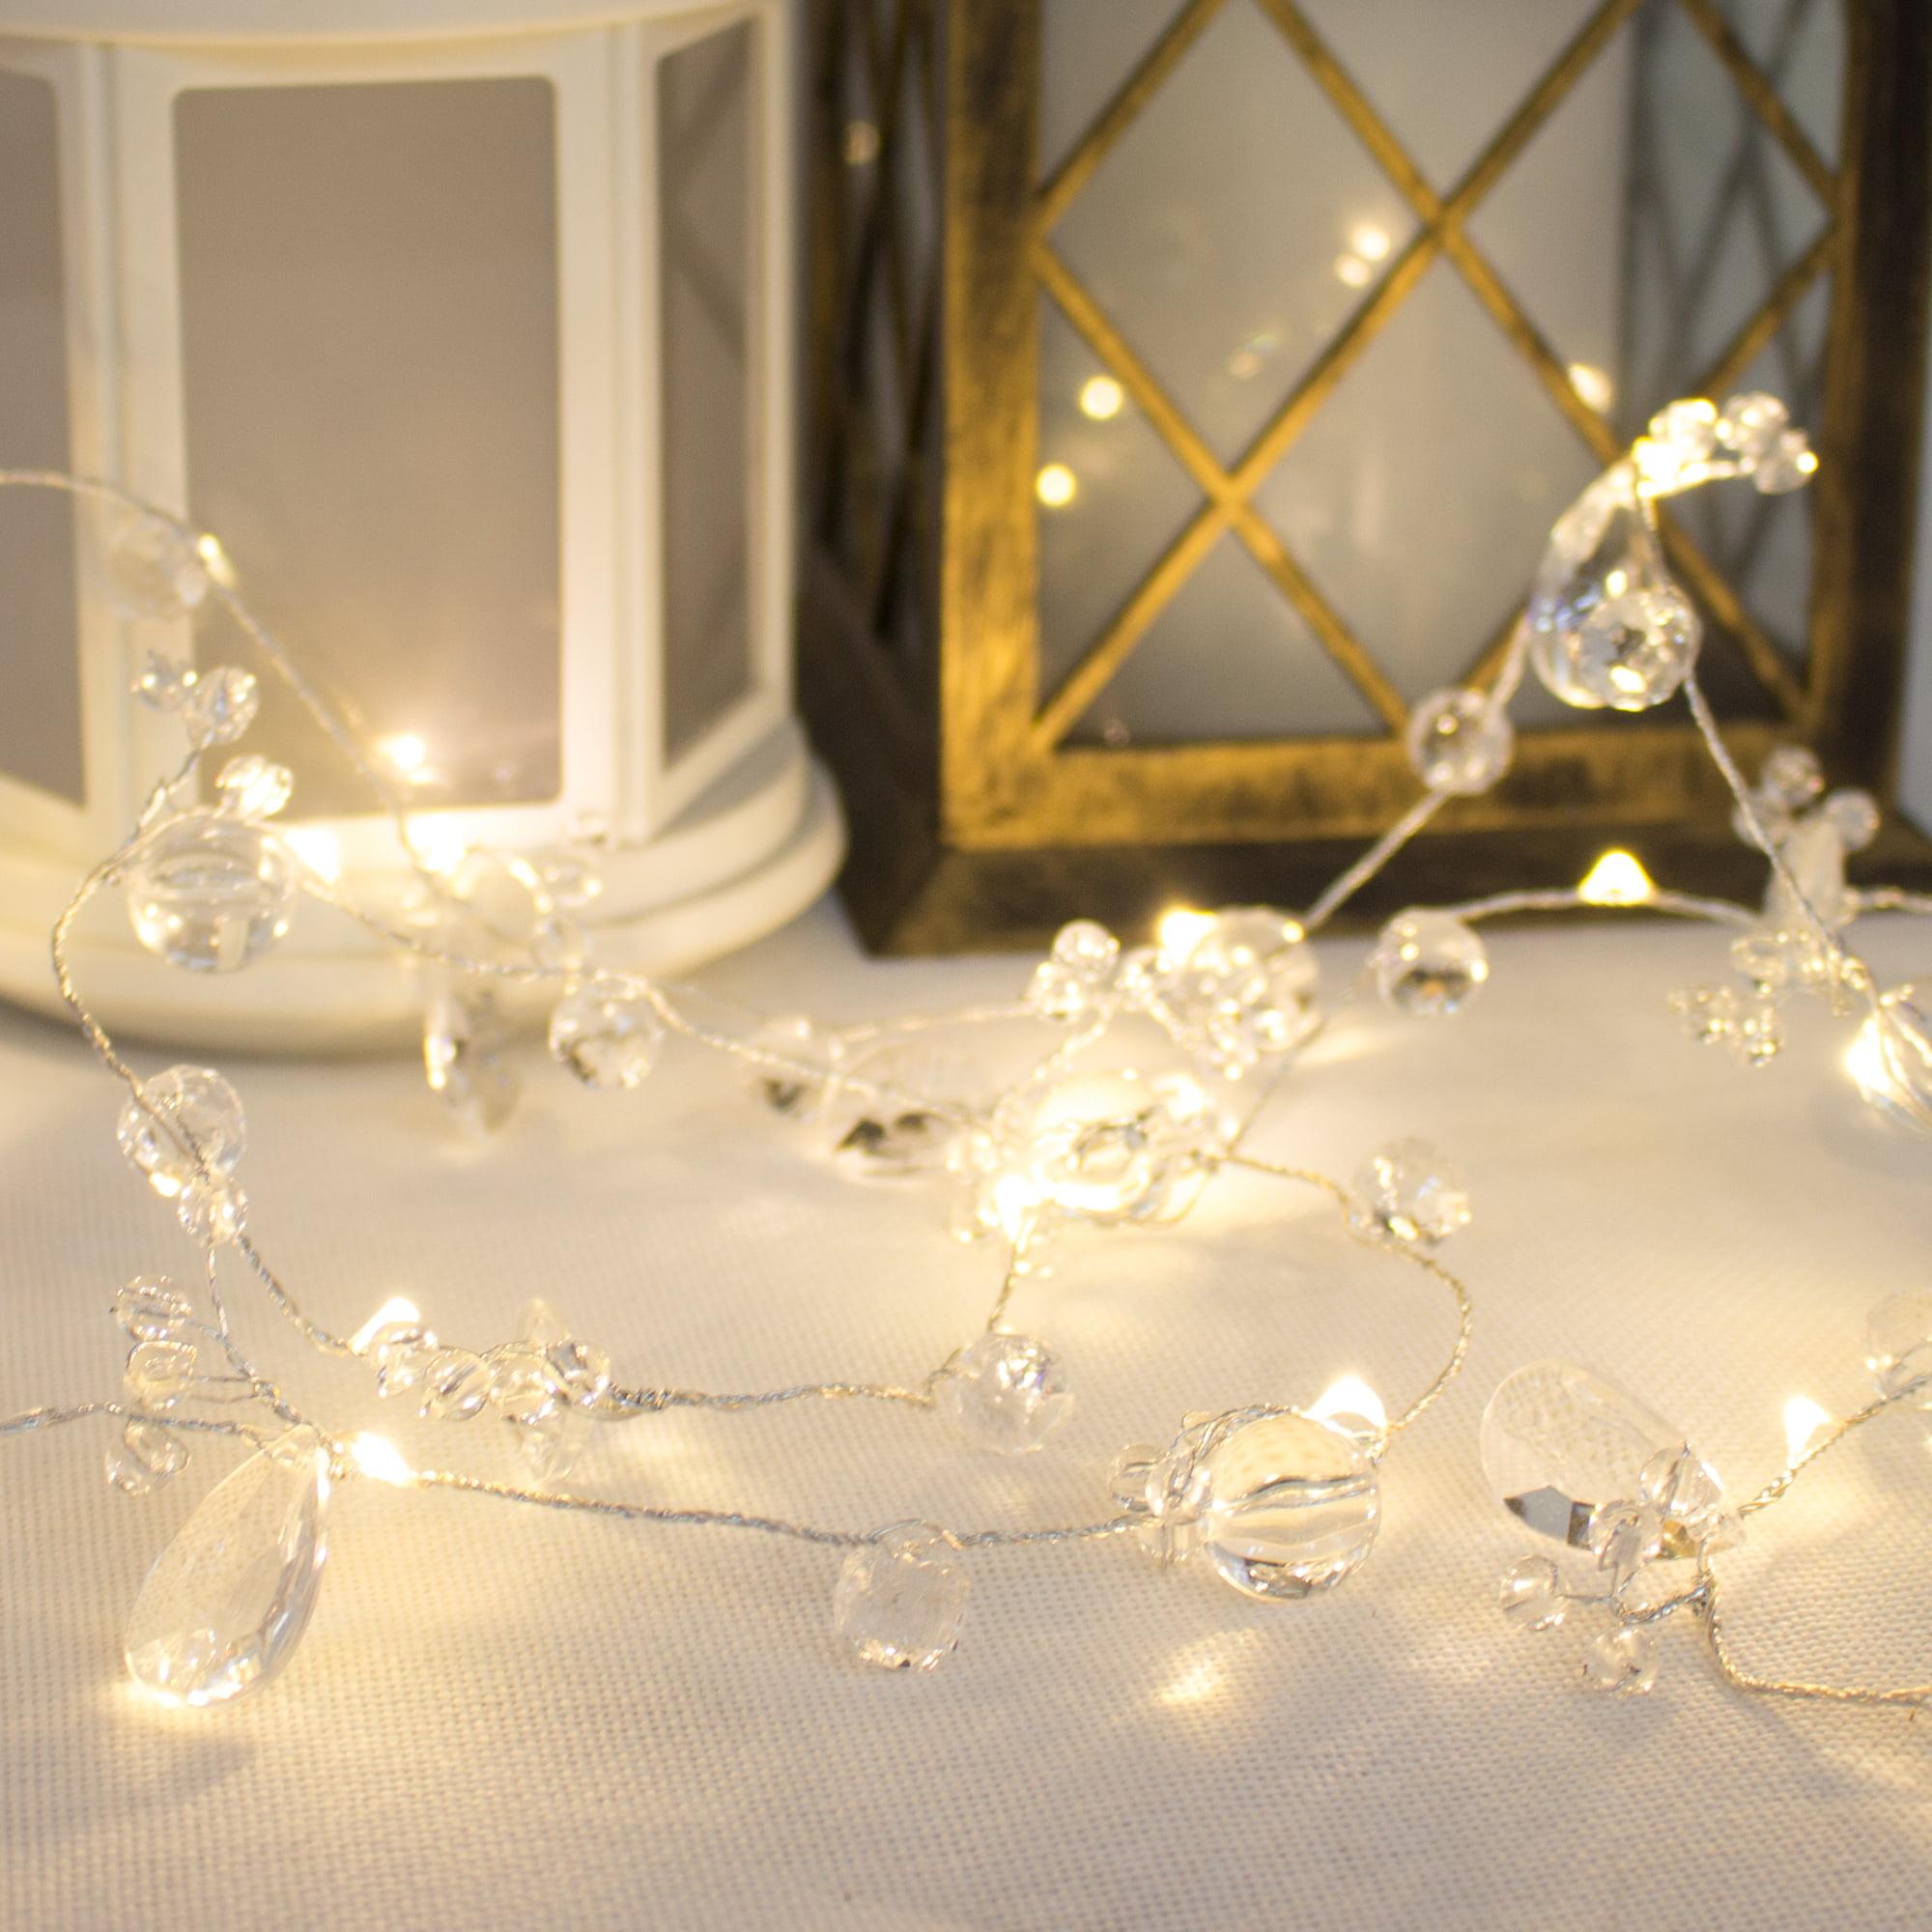 Way to Celebrate LED Lighted Jewel Bead Garland - Walmart.com